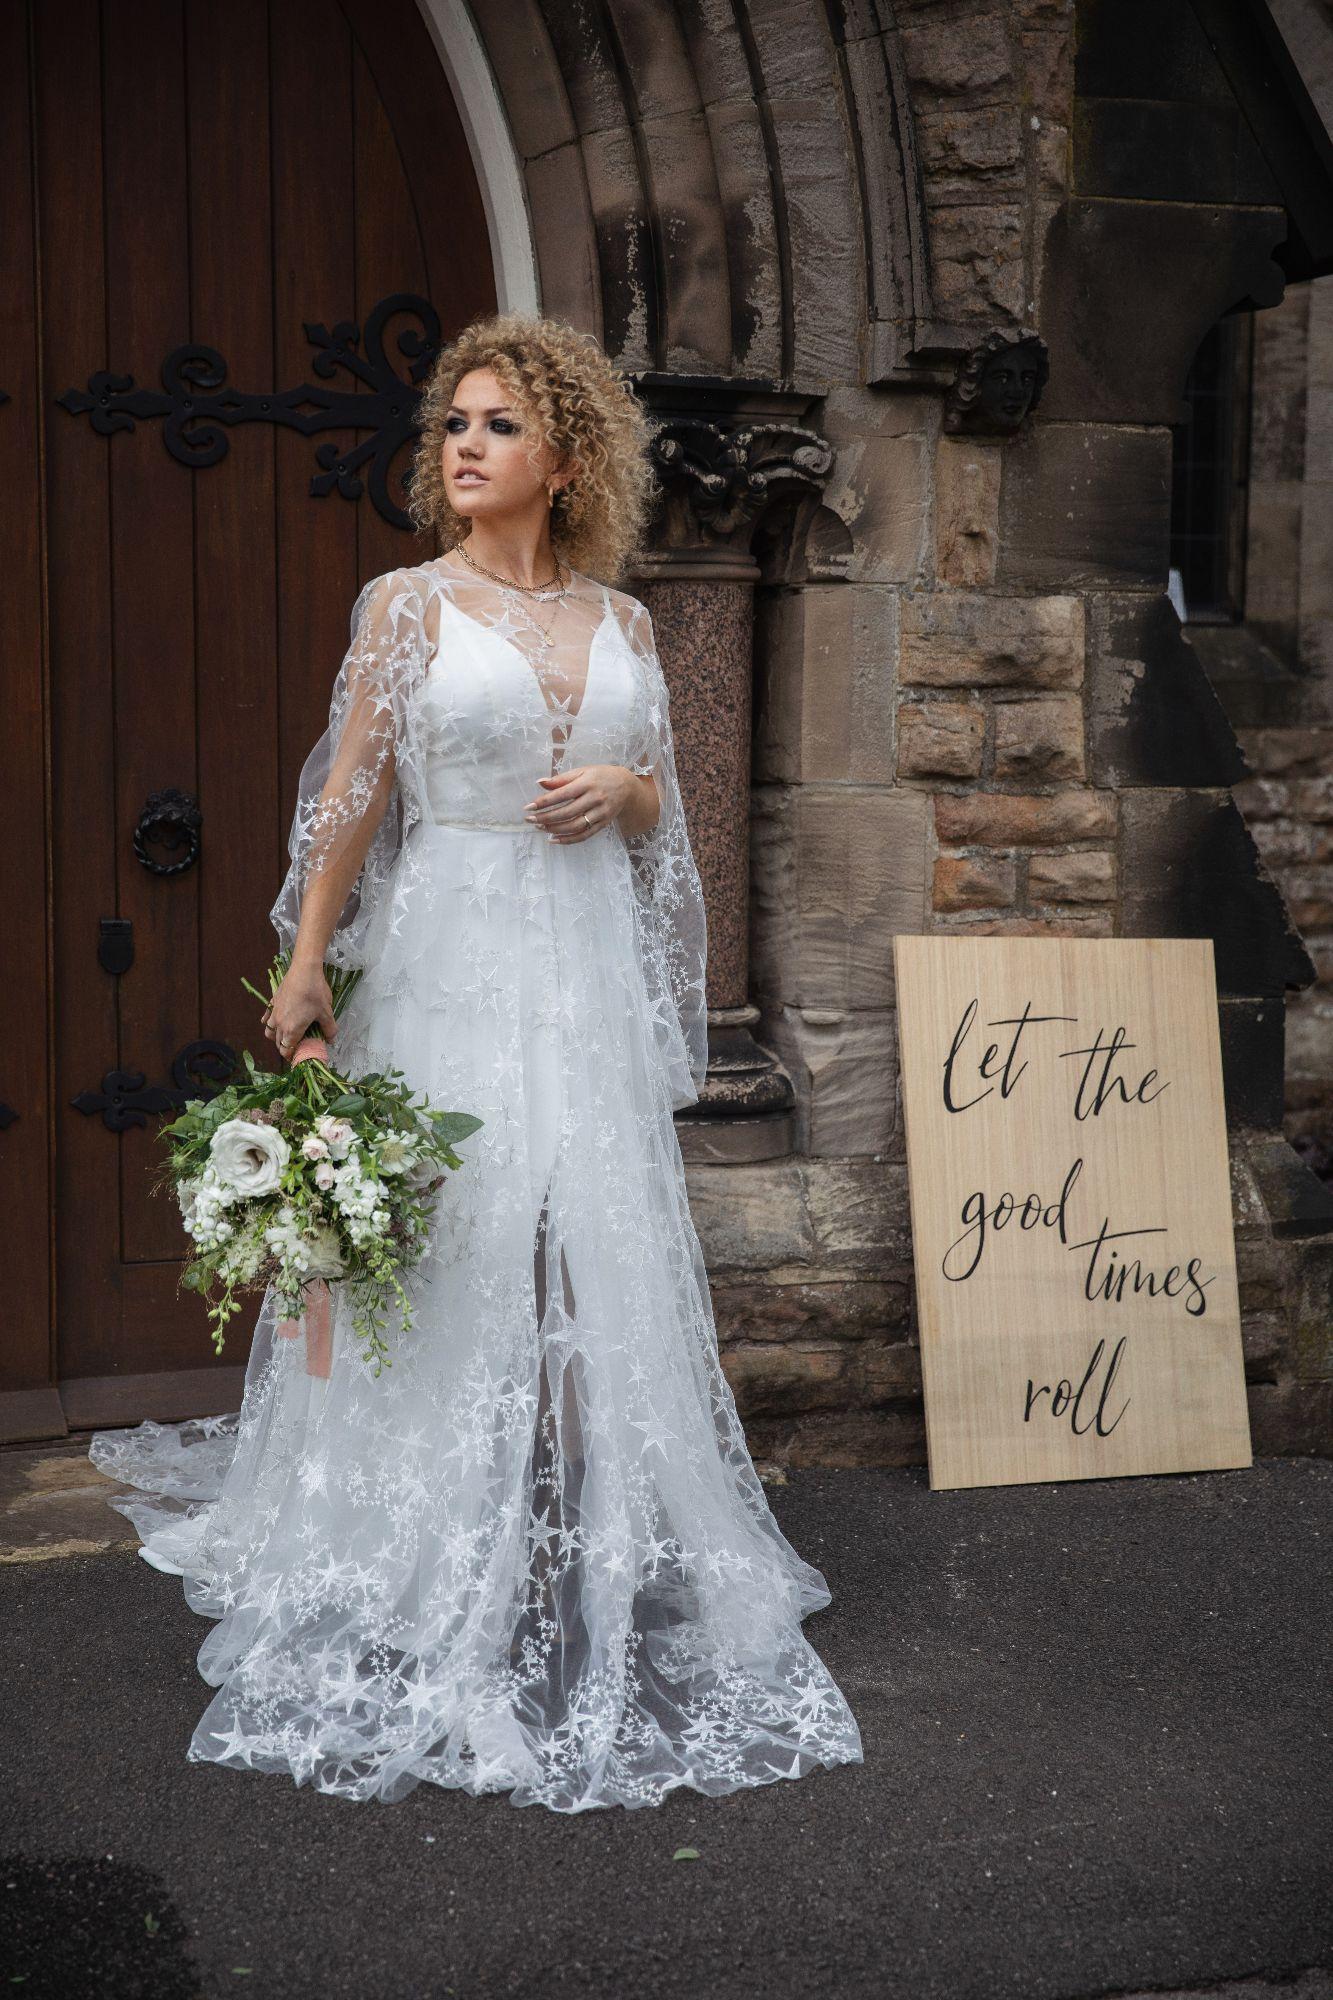 Las Vegas Wedding dress with ivory star tulle overlay